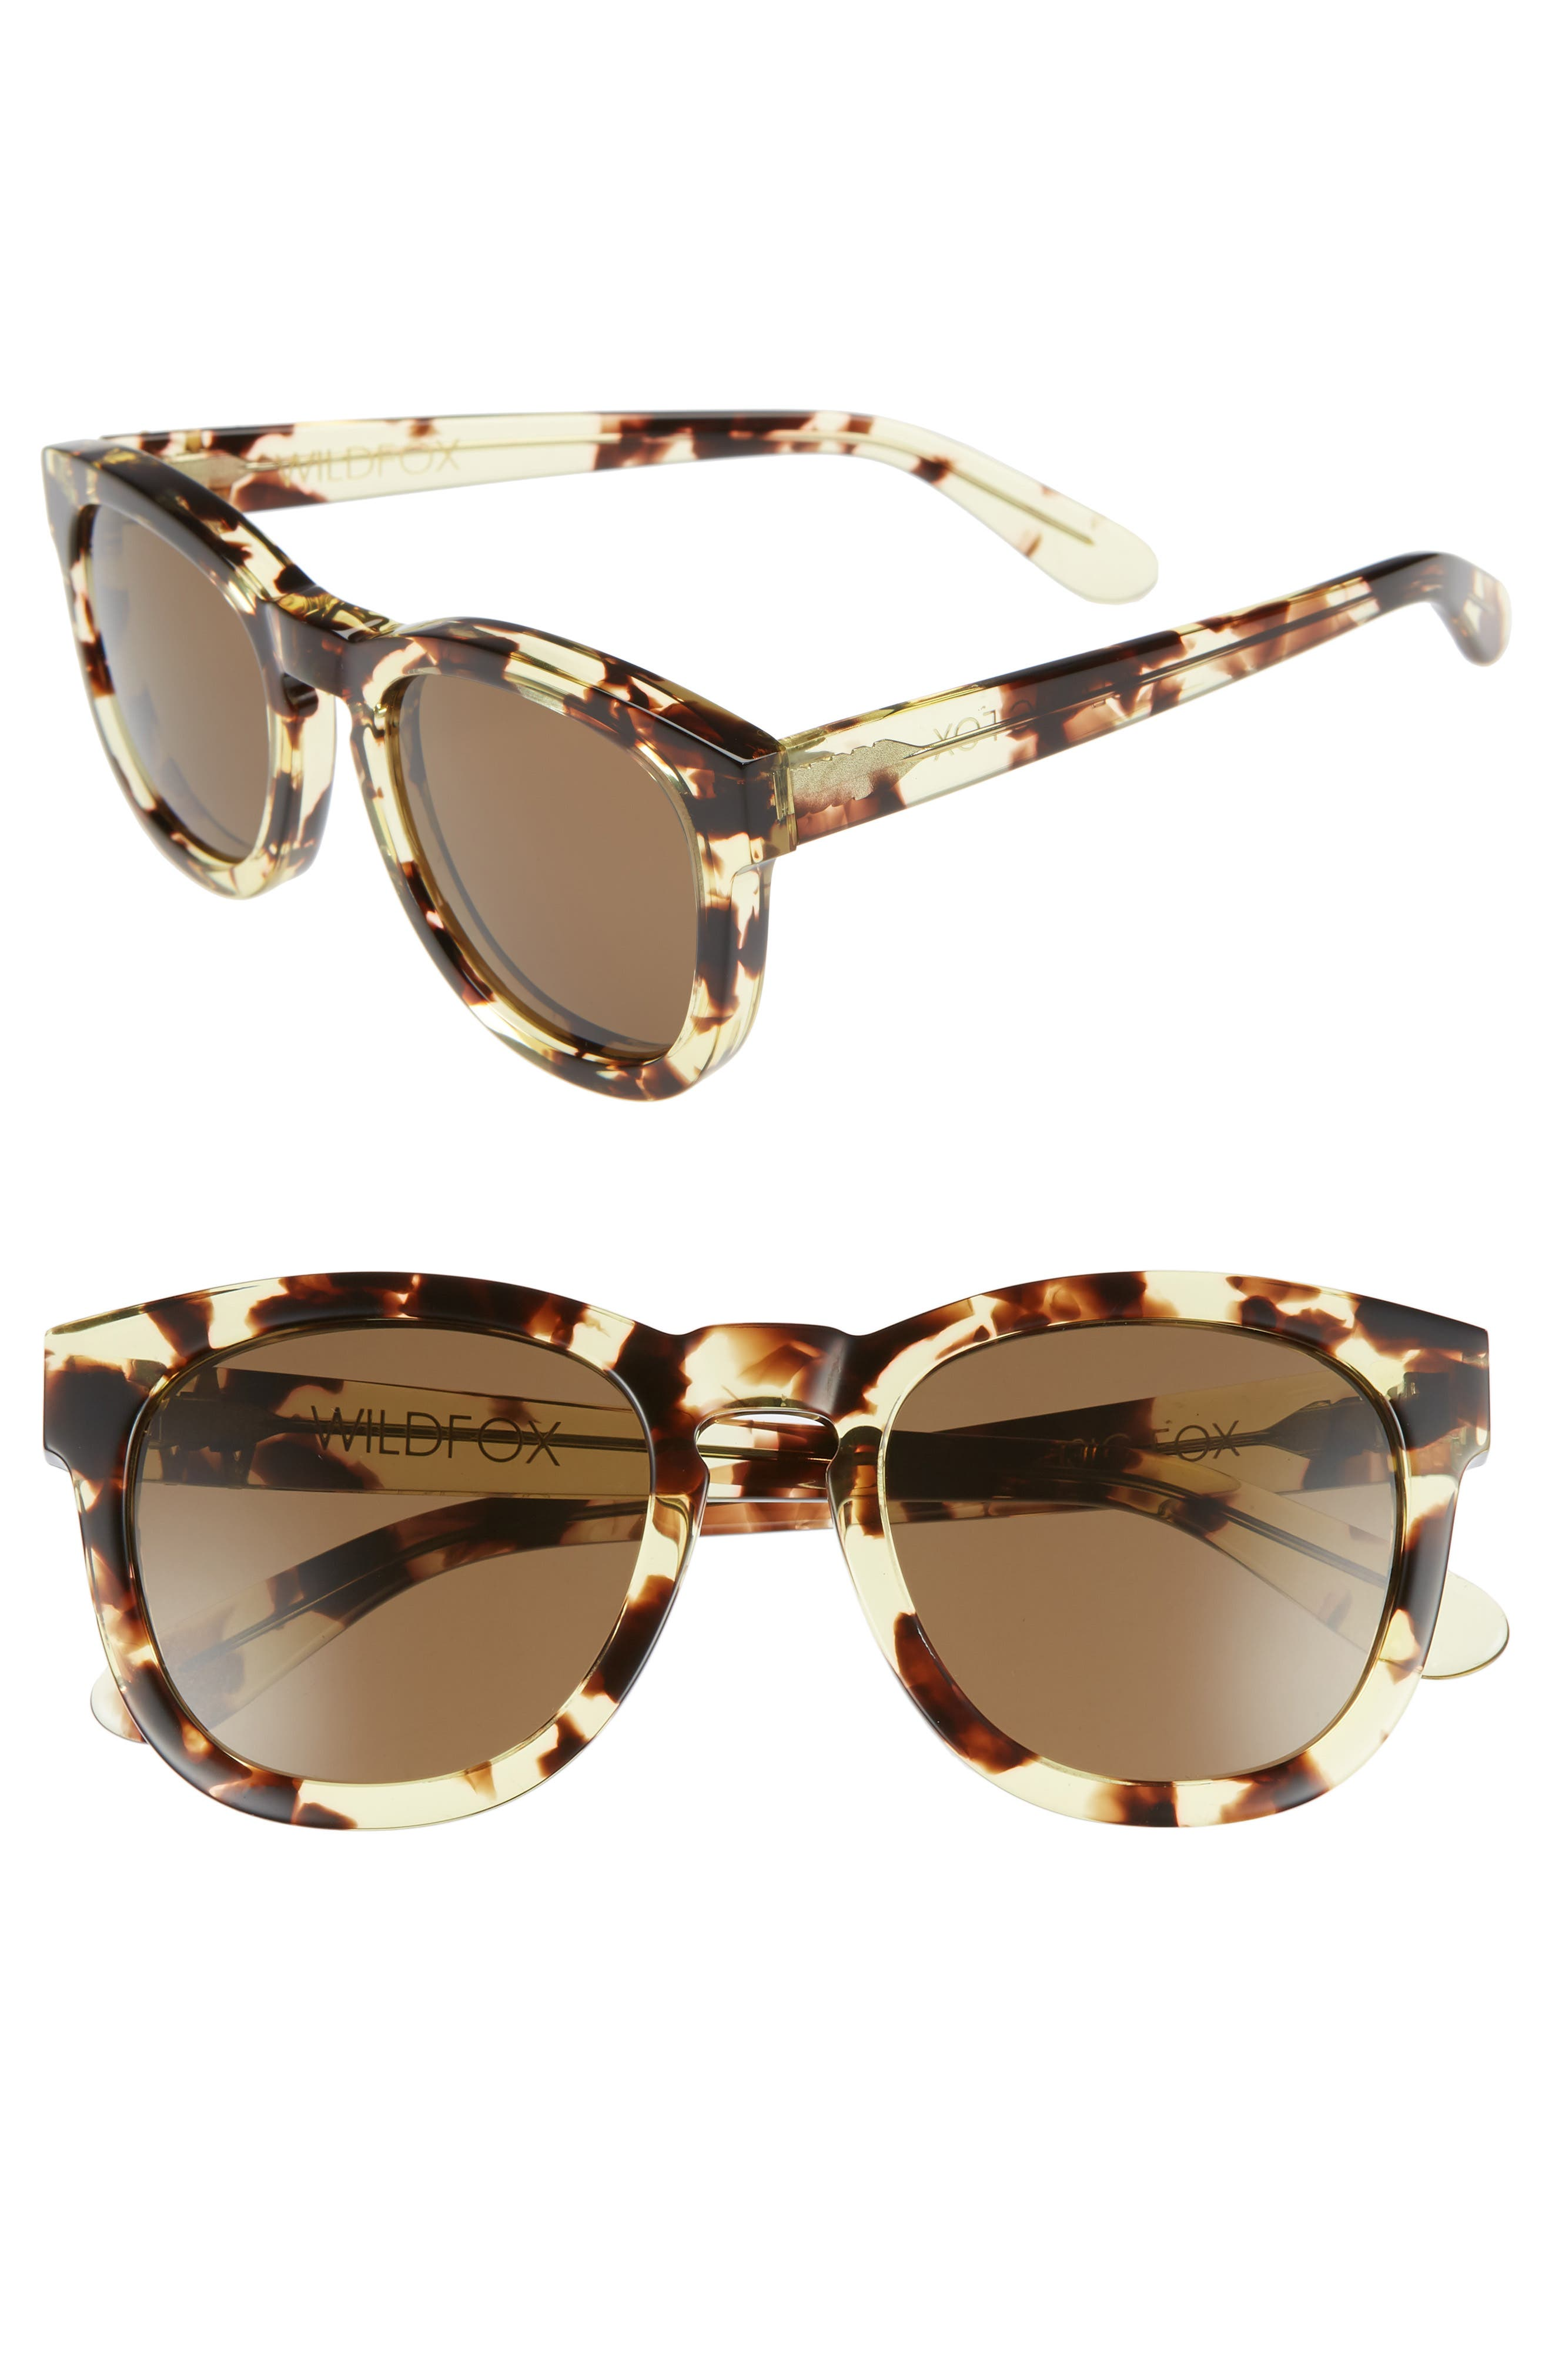 'Classic Fox' 50mm Retro Sunglasses,                             Main thumbnail 1, color,                             203